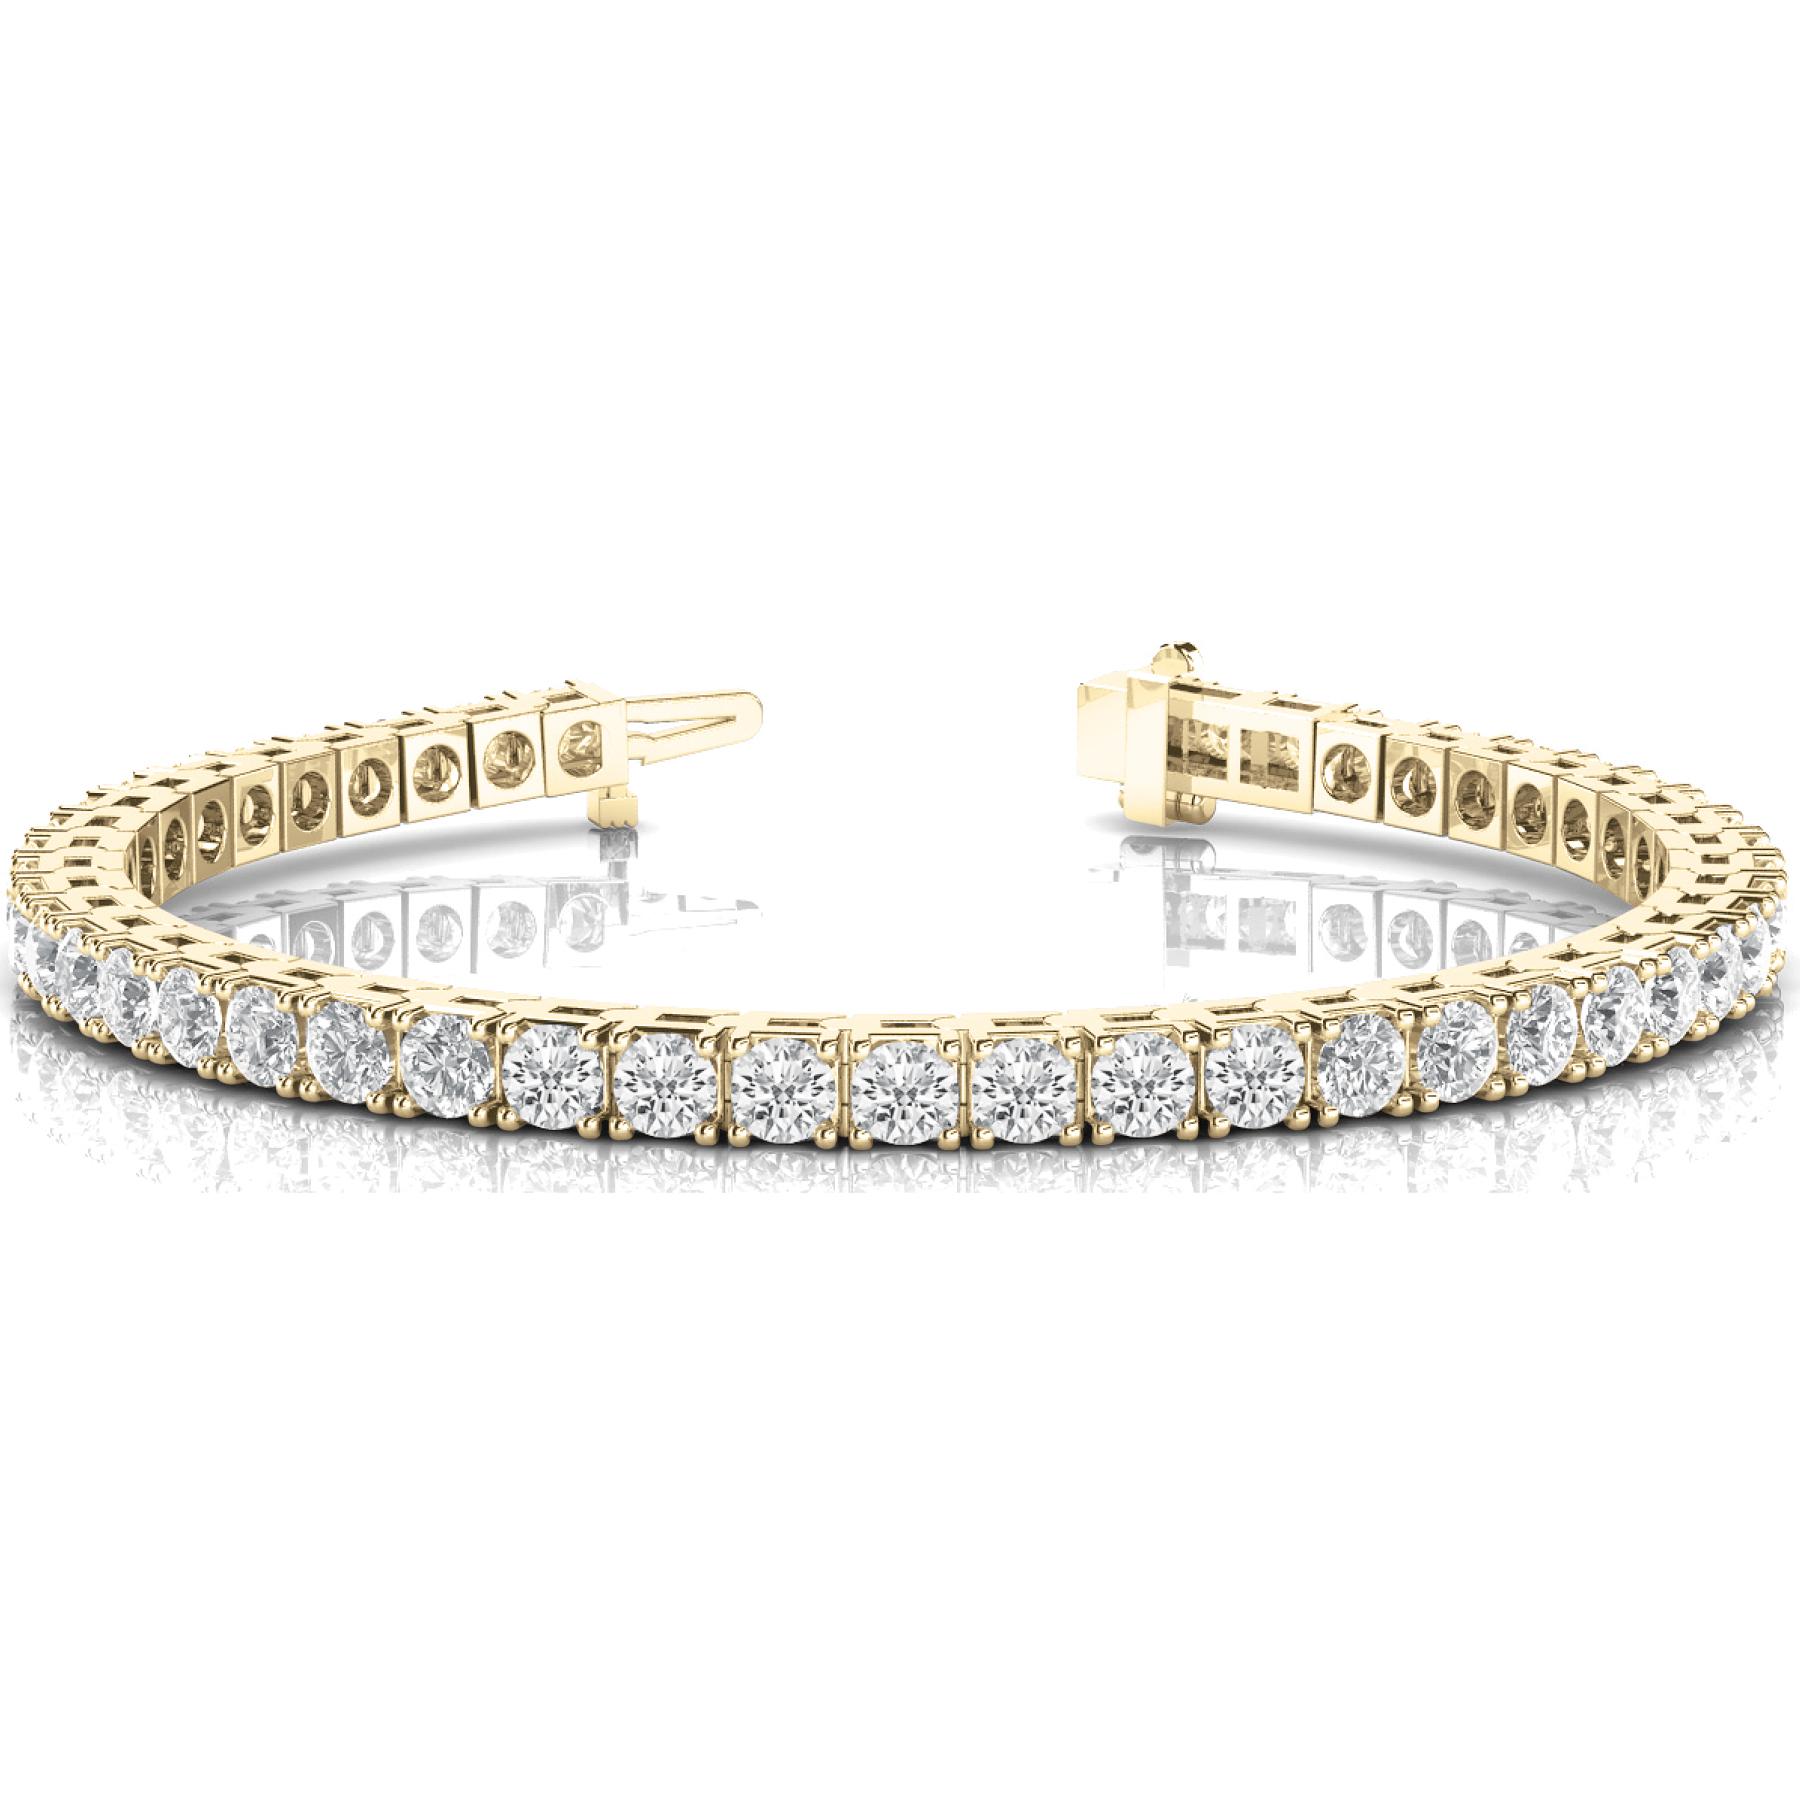 14k-yellow-gold-prong-set-tennis-diamond-bracelet-4490-01-05